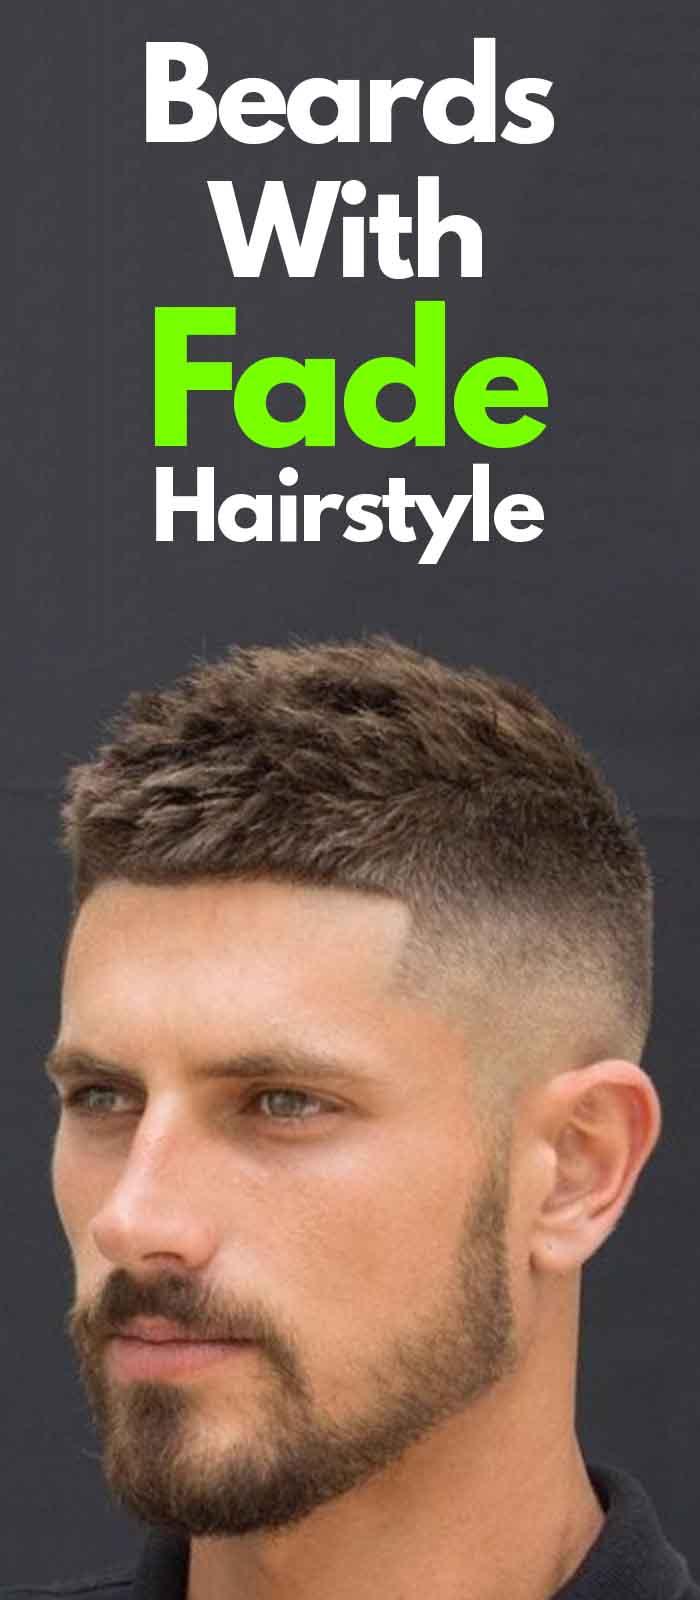 Fade Haircut with short Beard ideas for men!